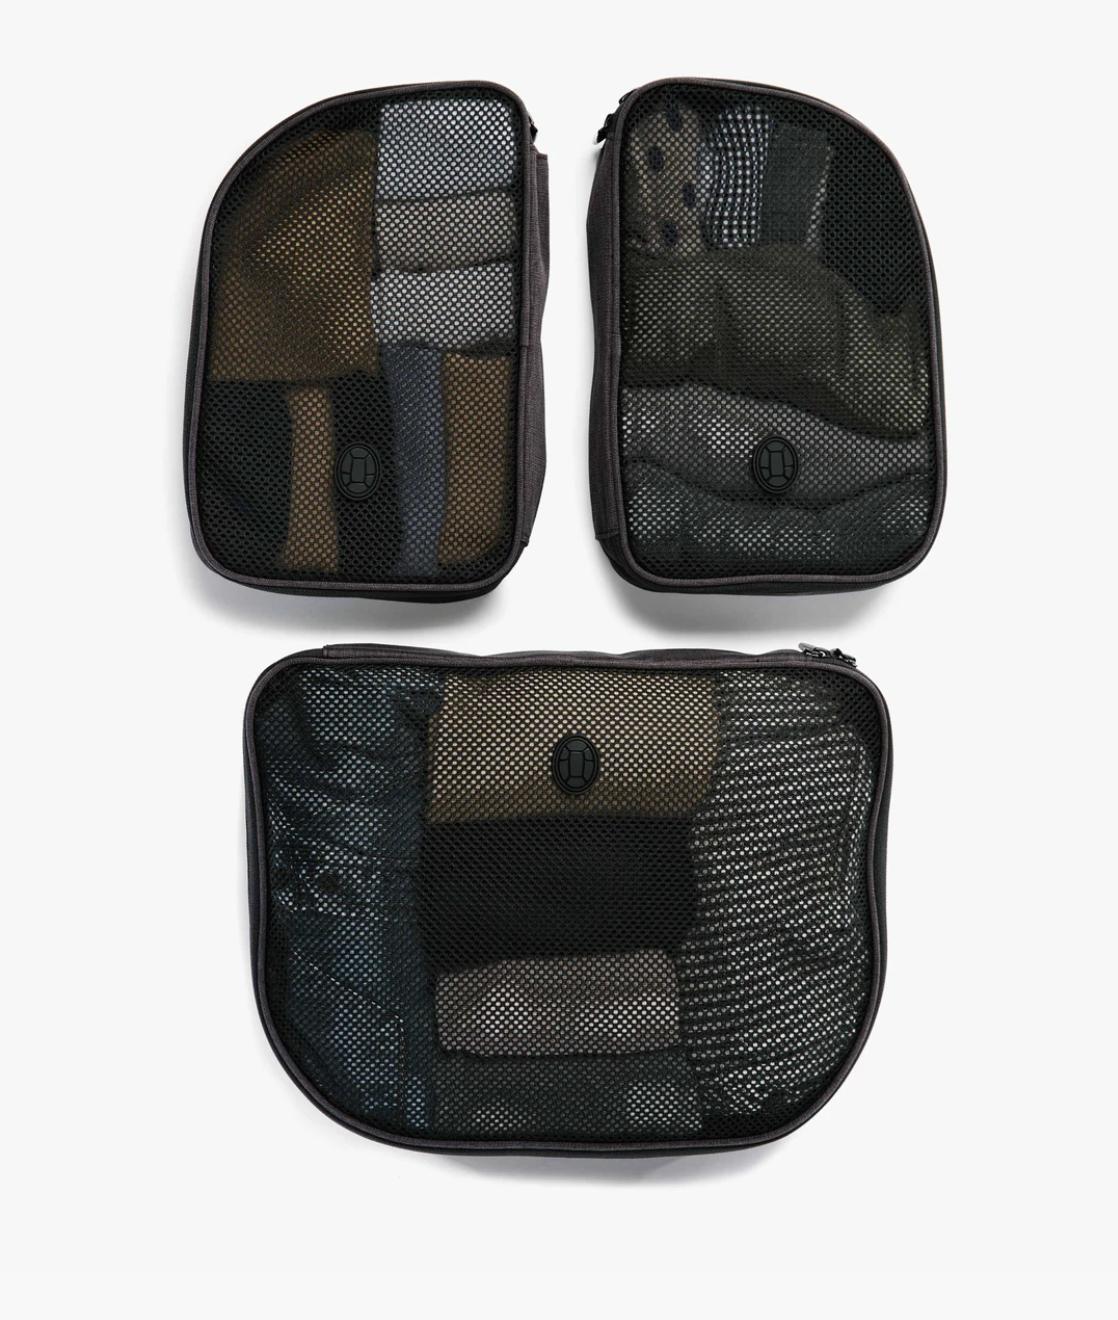 Tortuga Backpack Setout Packing Cubes